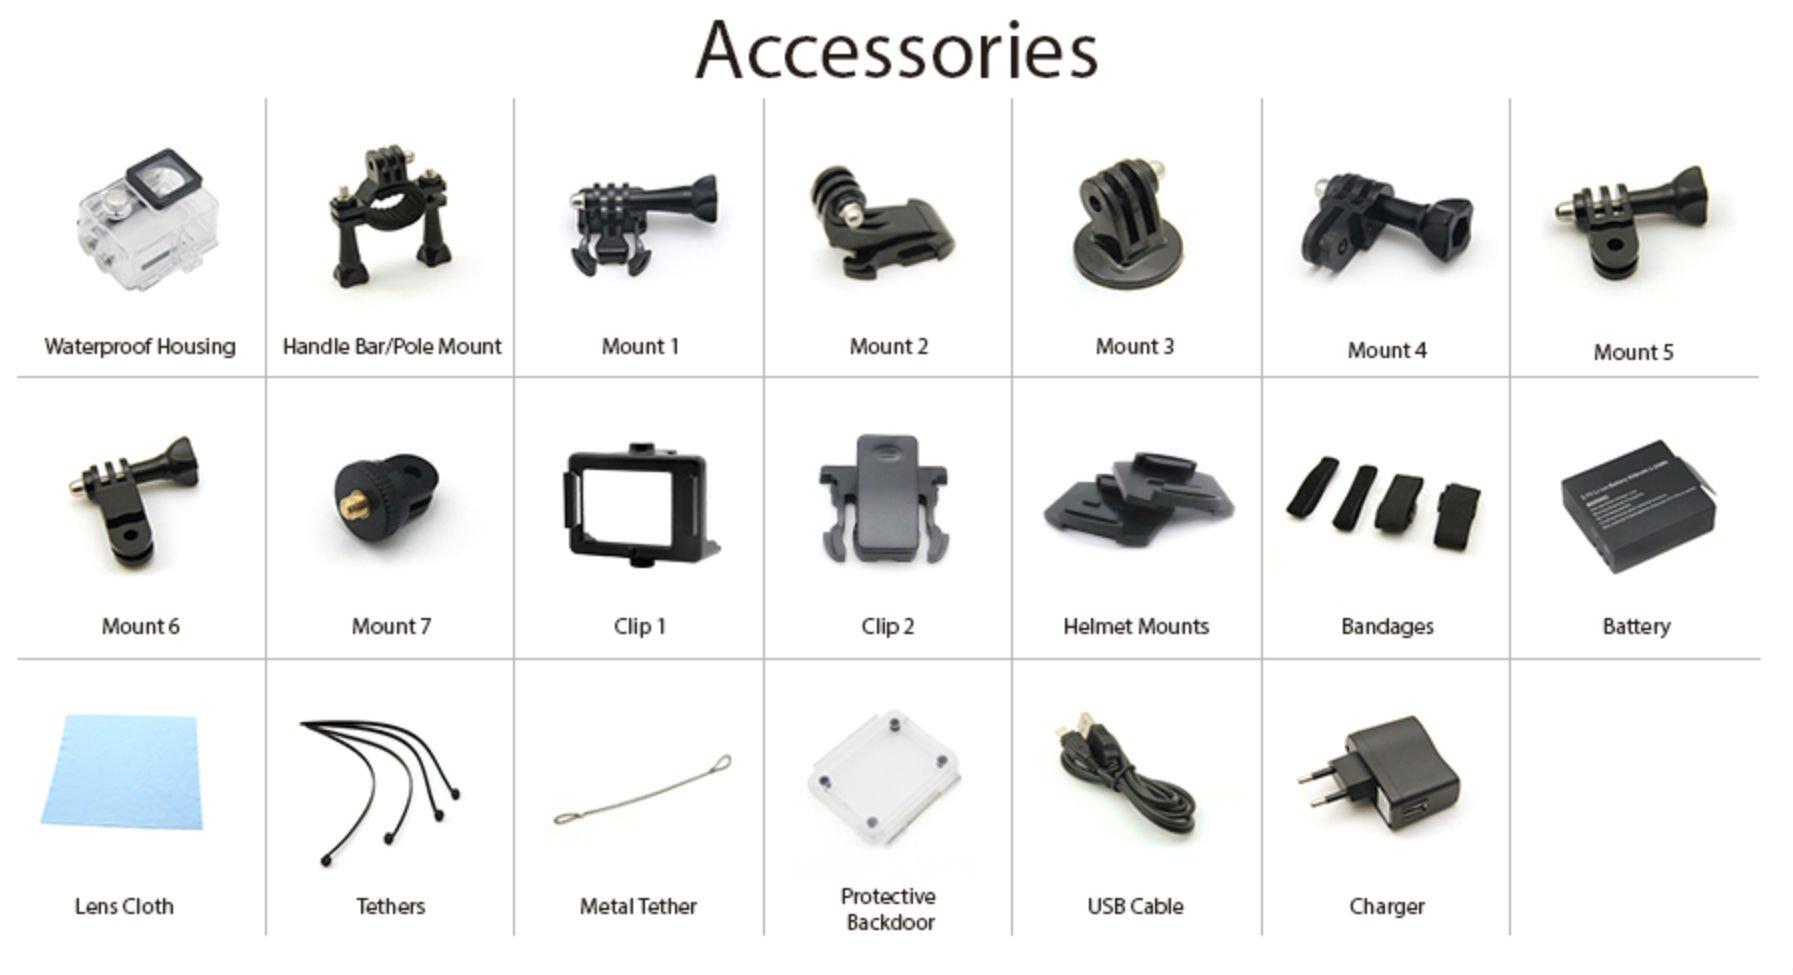 EKEN-H9-4K-accessories